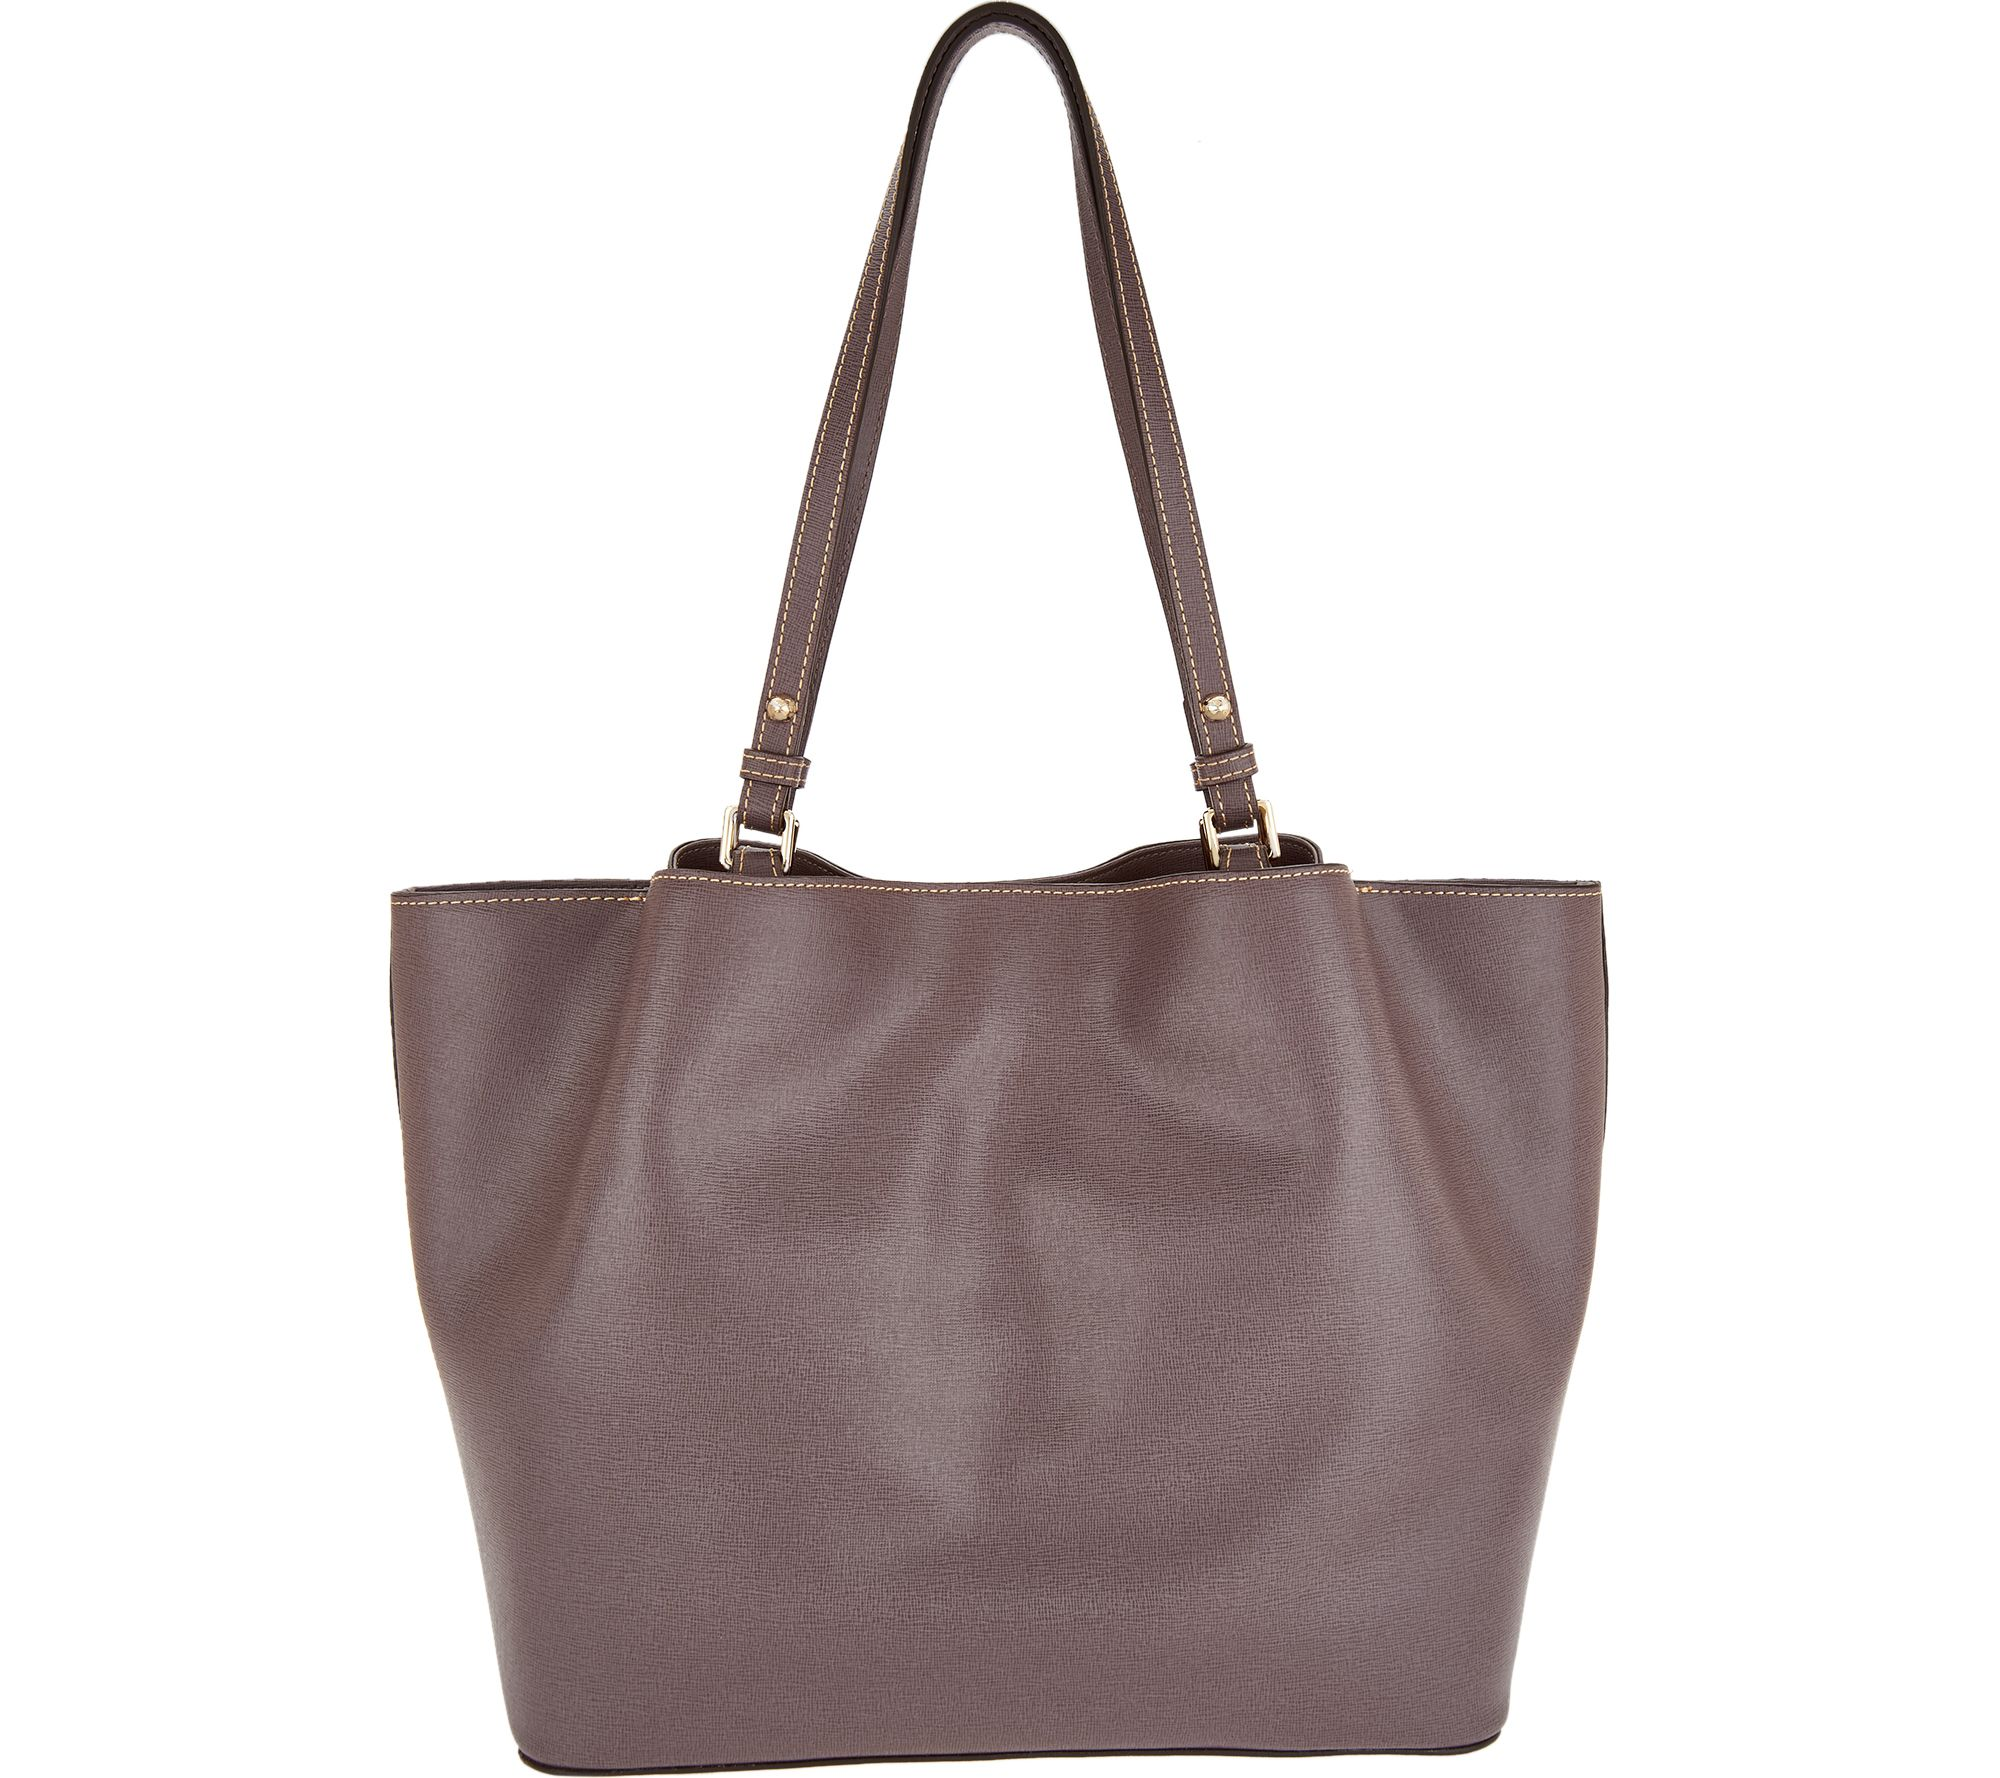 9f6657caec Dooney   Bourke Saffiano Leather Shoulder Bag -Flynn - Page 1 — QVC.com